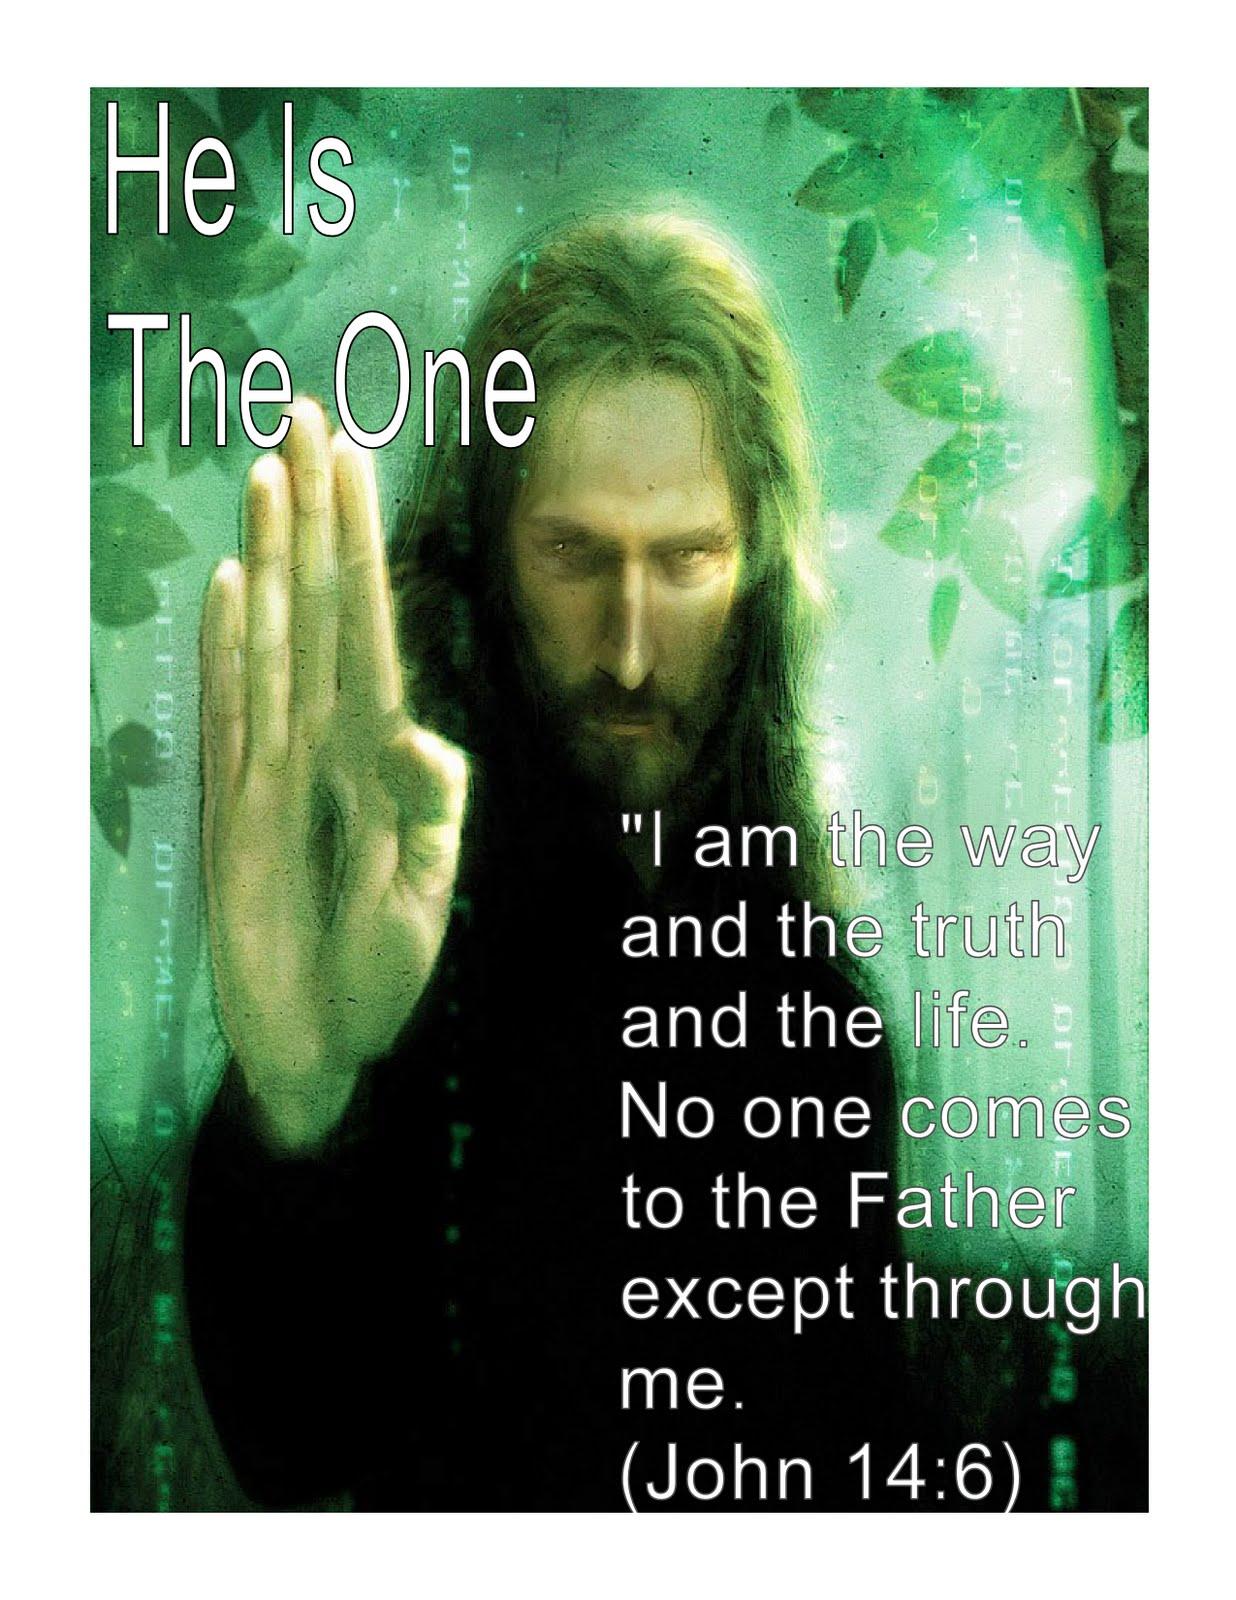 http://1.bp.blogspot.com/_gApZcjZyCsA/S-xrc3lXsGI/AAAAAAAAADI/xMcS9kN4uPA/s1600/Jesus%2BMatrix.jpg